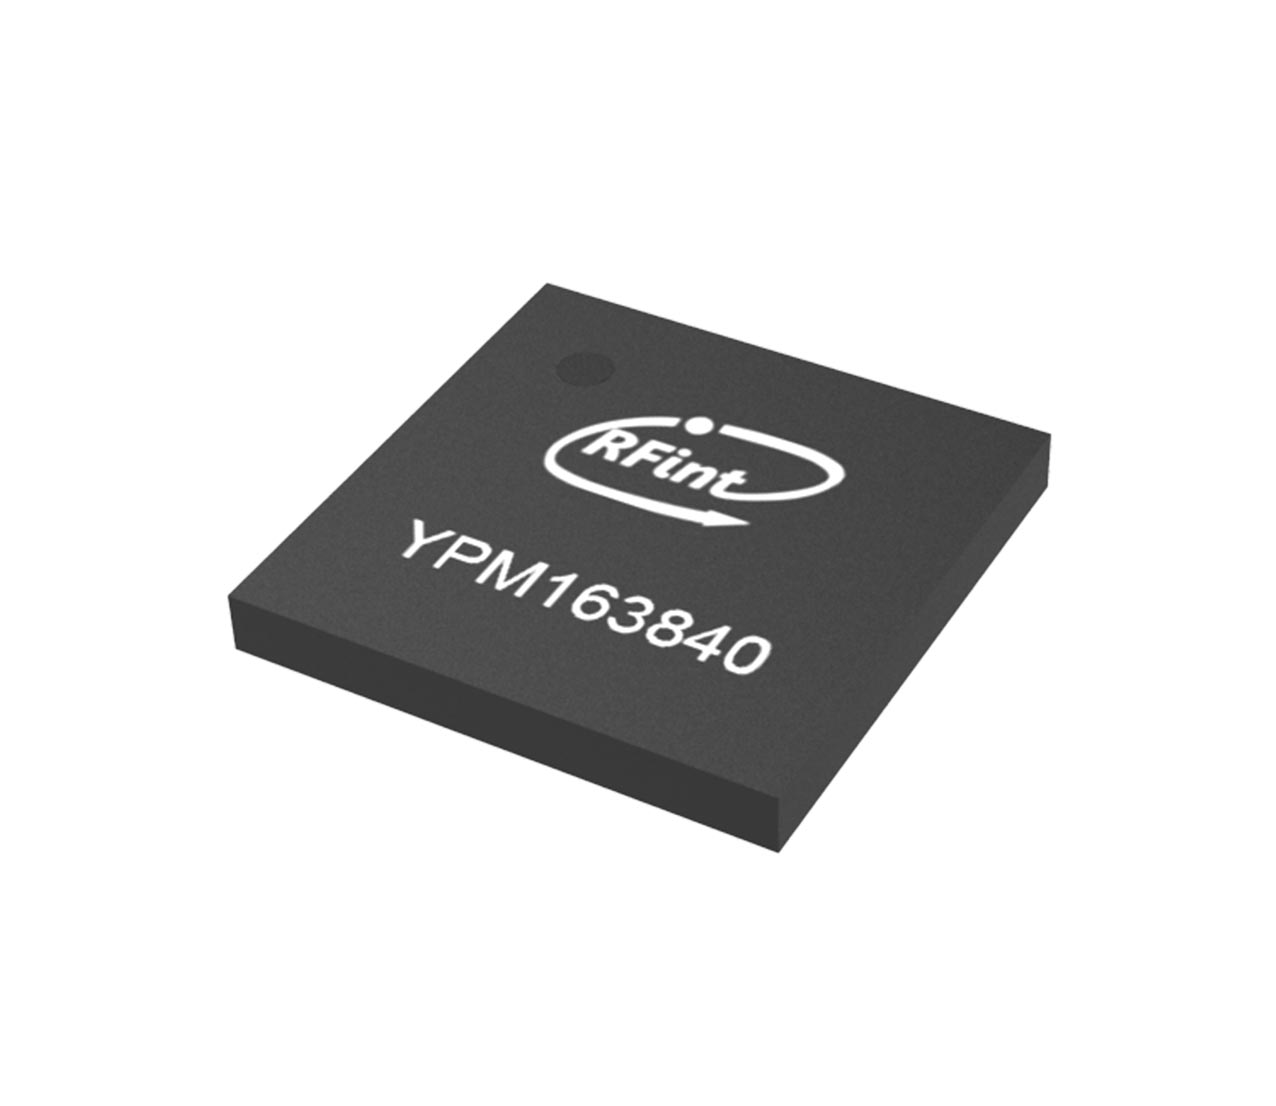 YPM163840